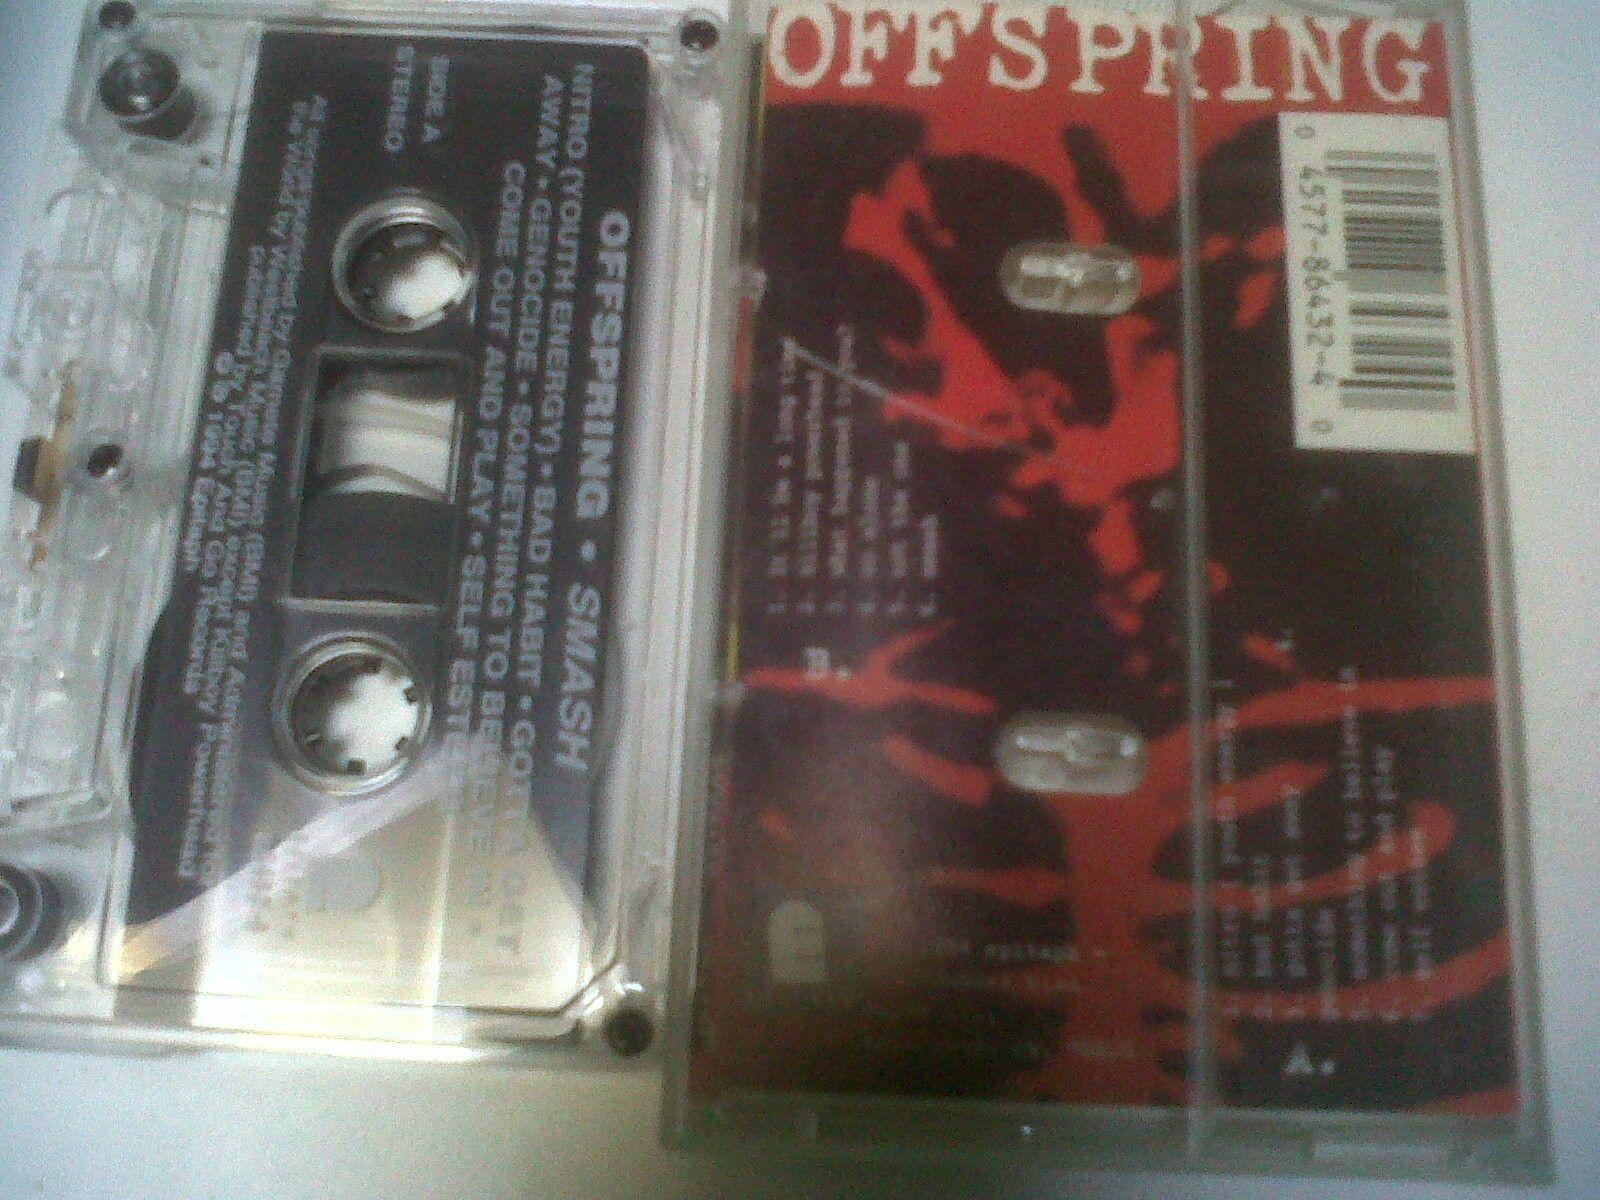 The Offspring Smash USA Cassette case nitro stereo epitaph killboy powerhead 94